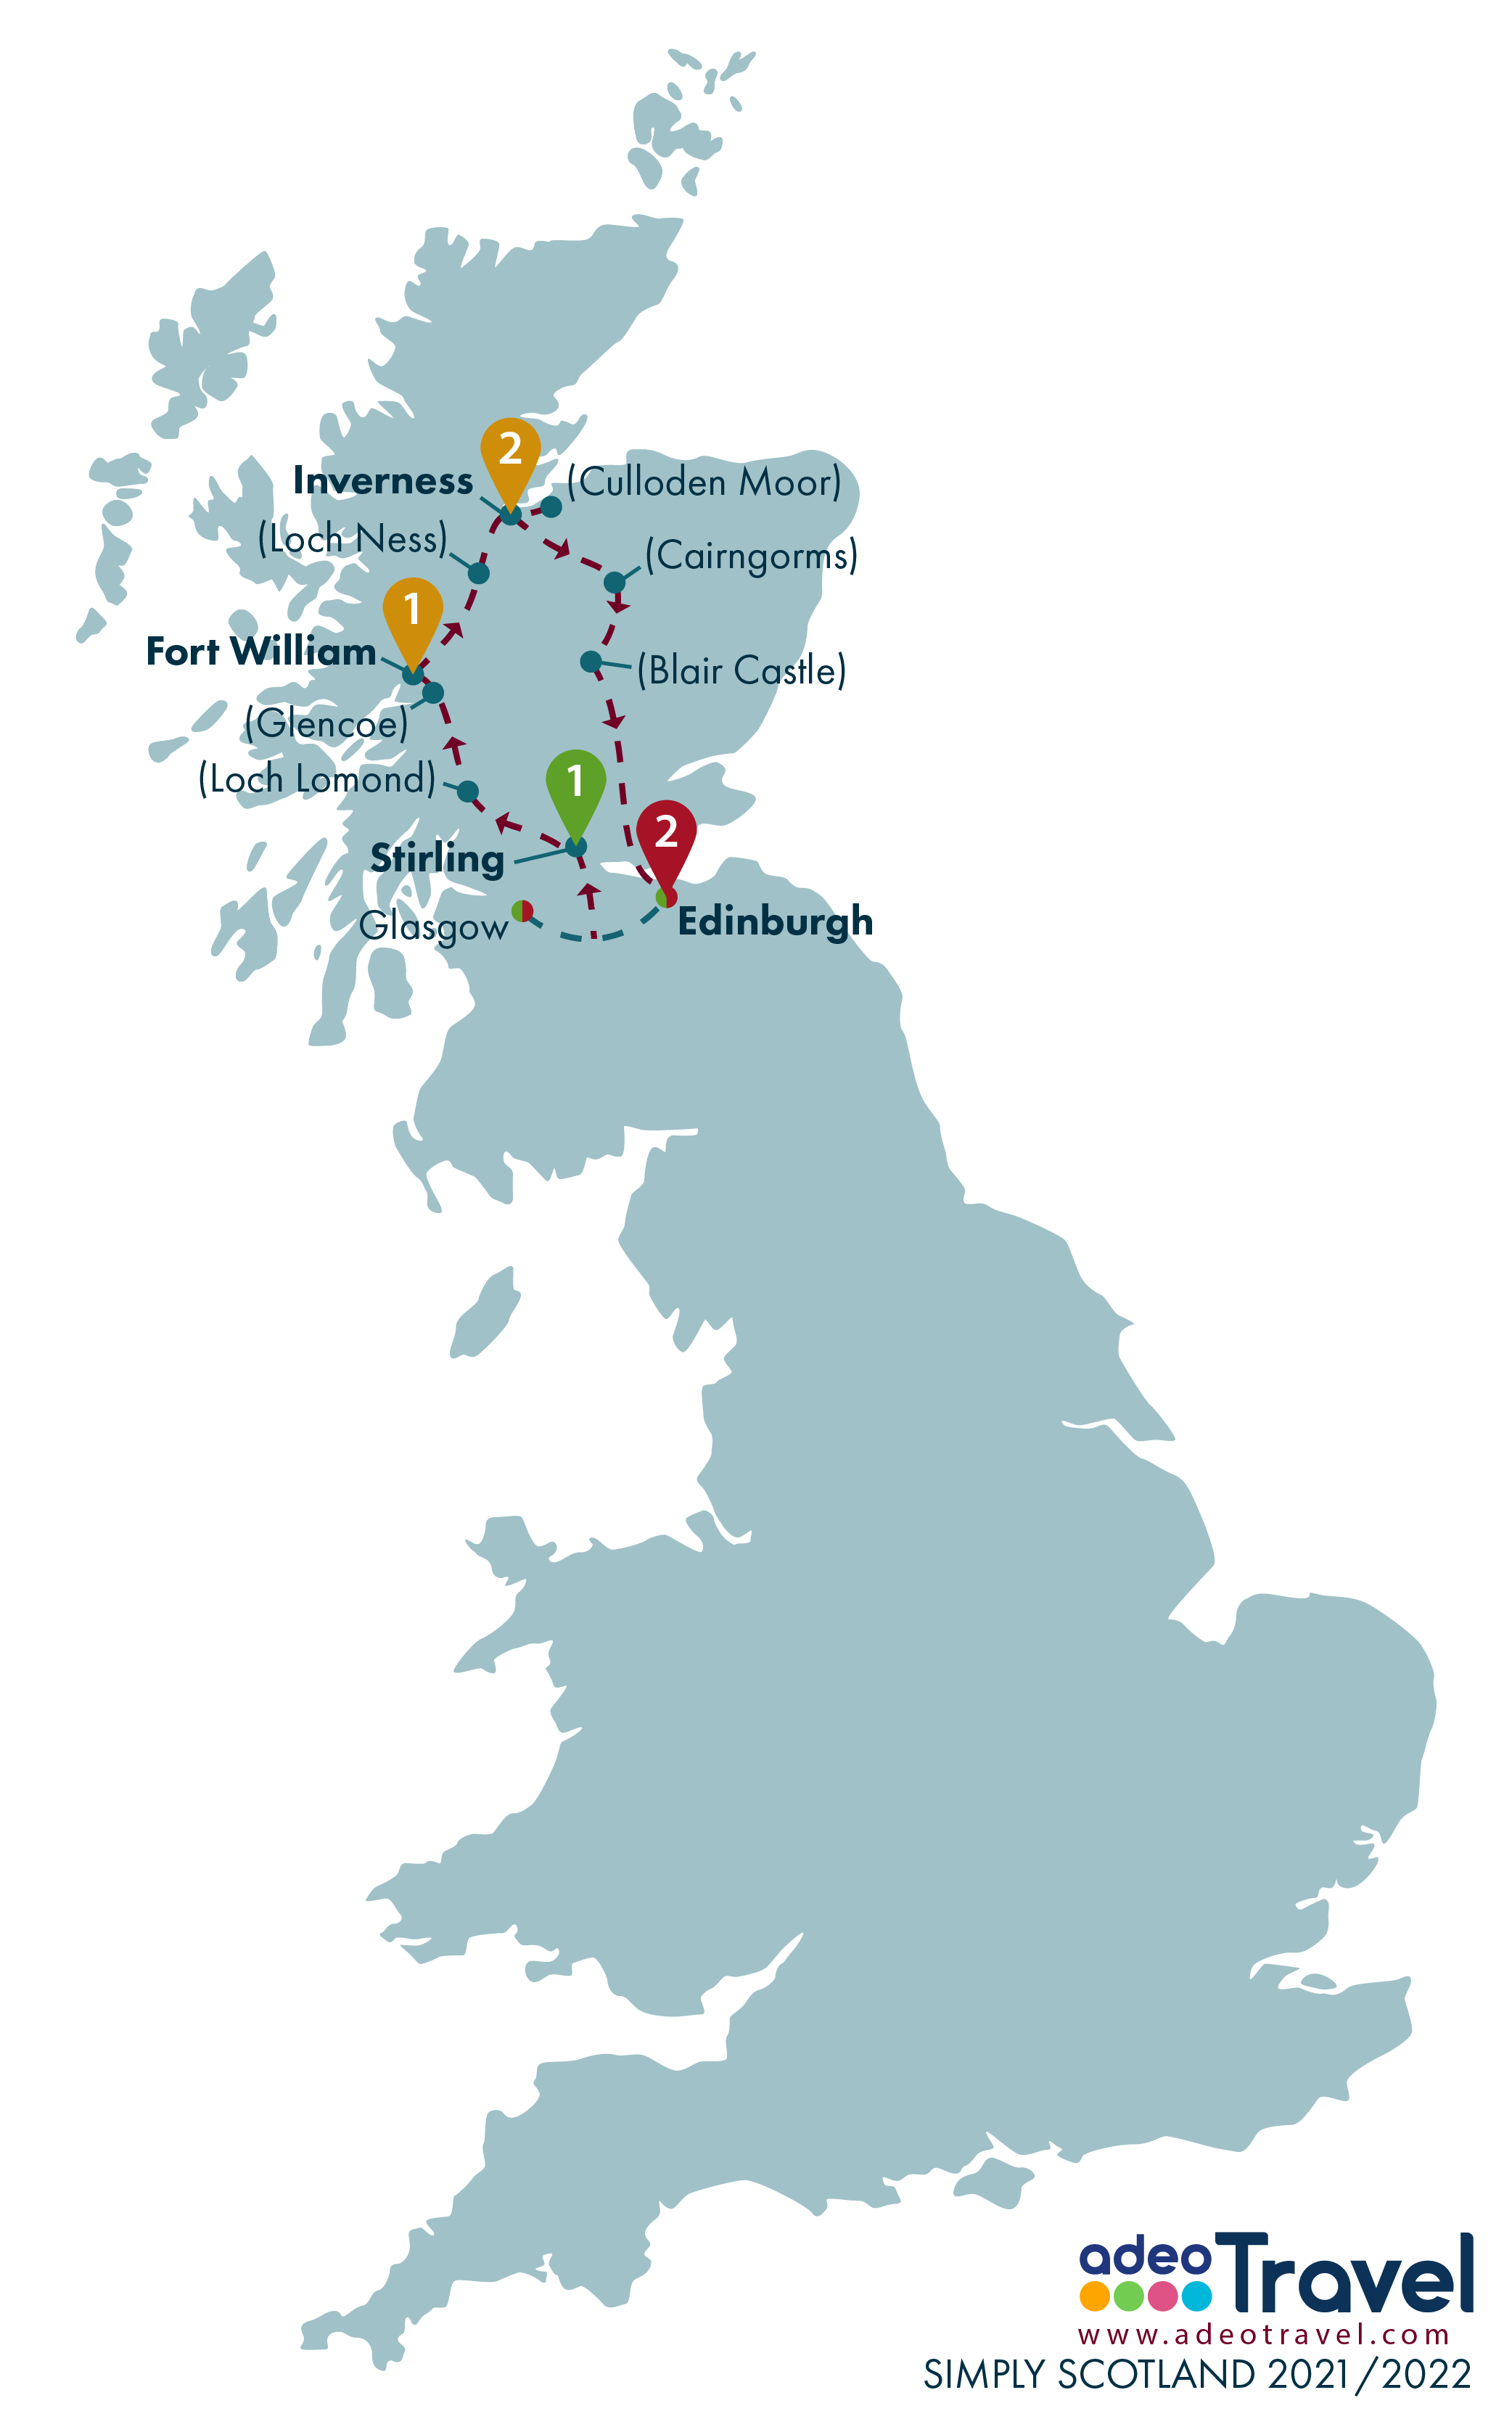 Map - Simply Scotland 2021 2022